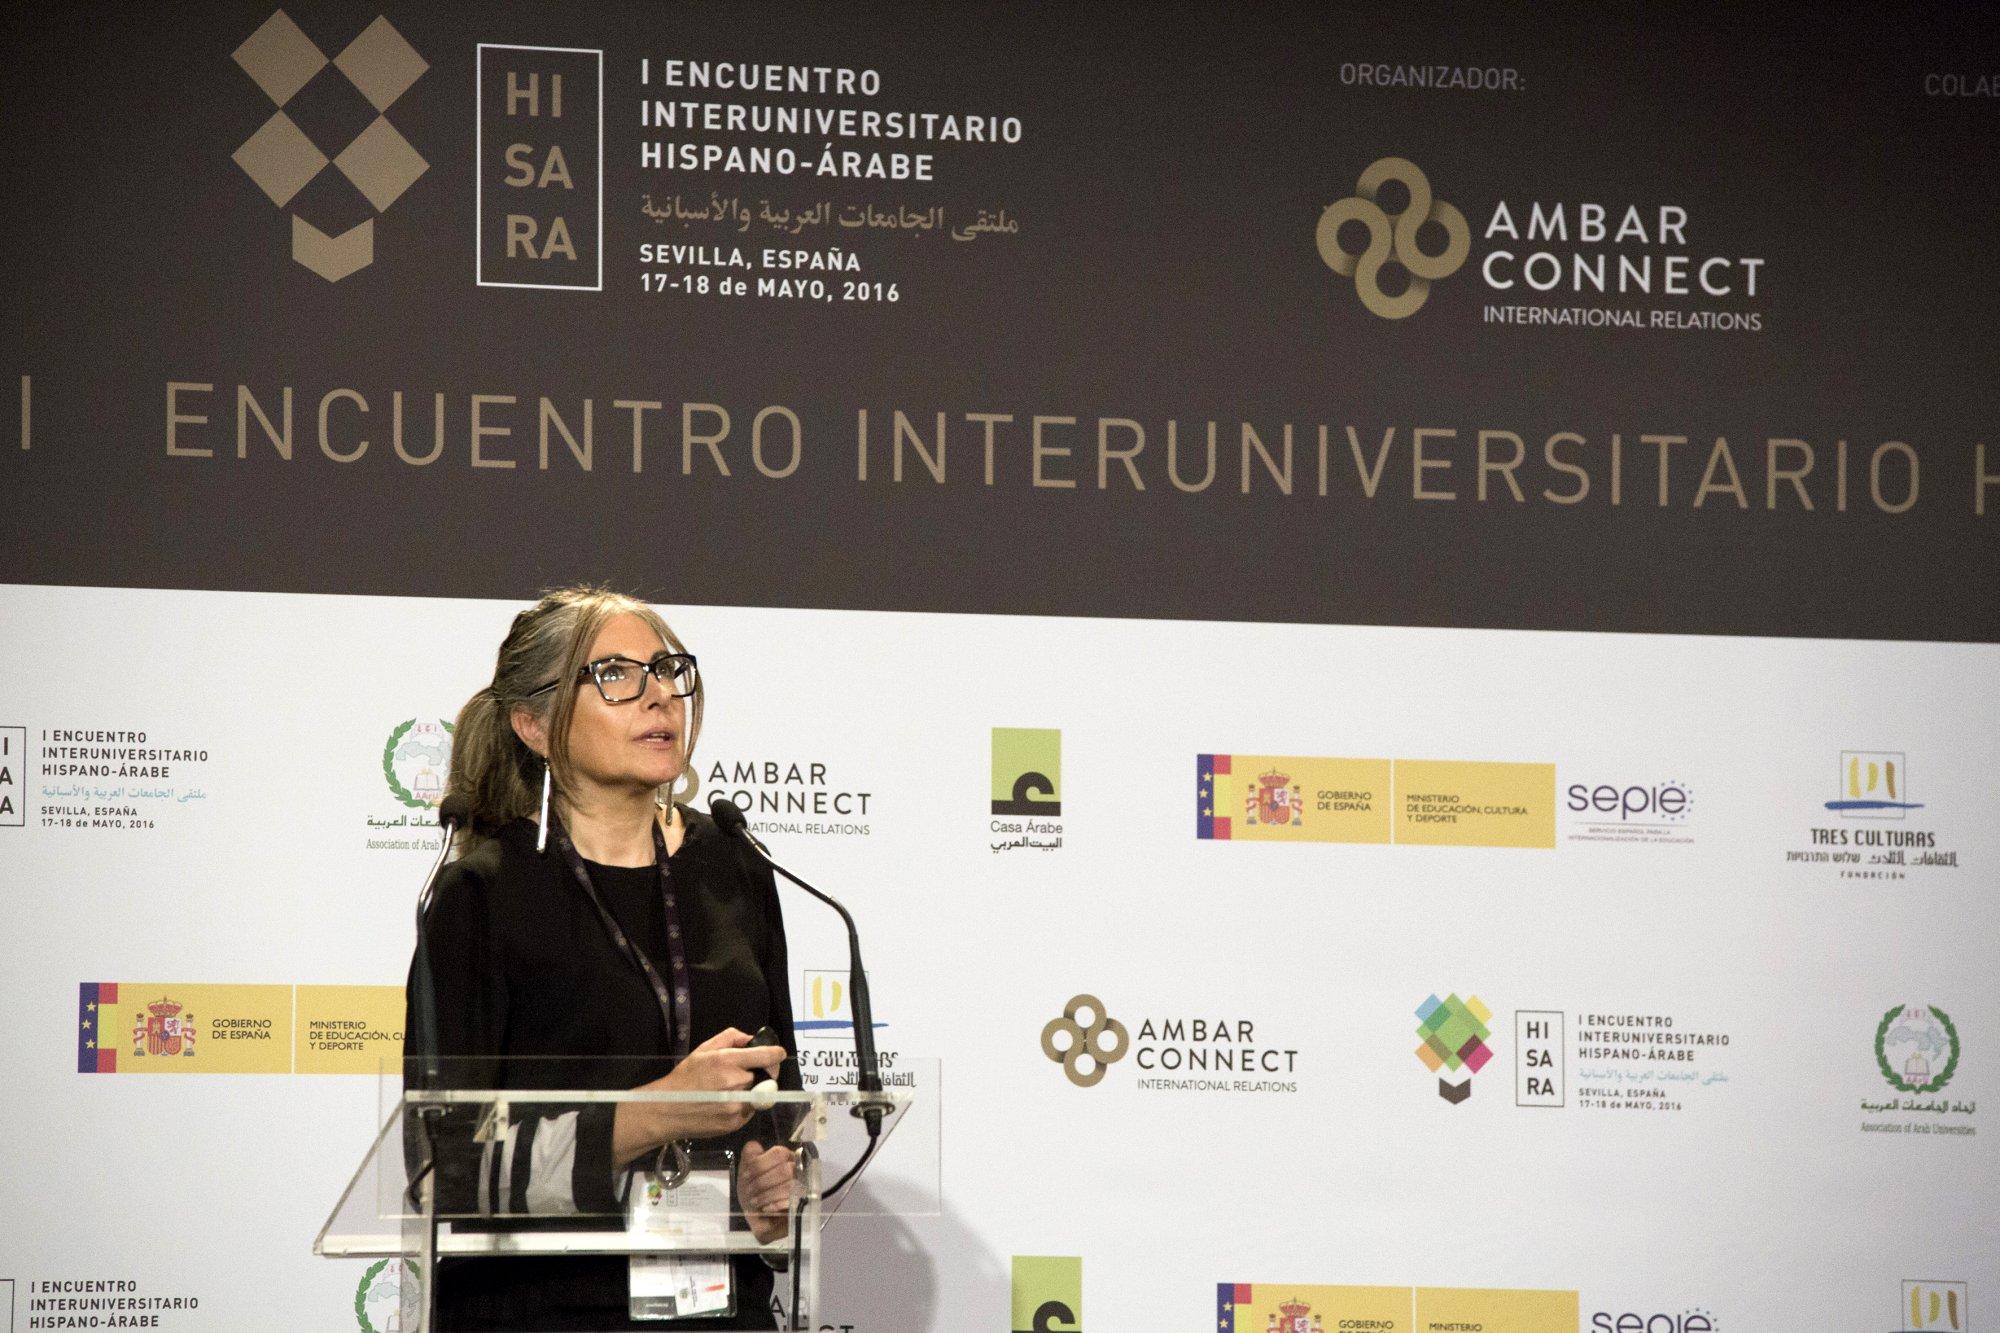 Ms. Helena Martínez from Universitat Politècnica de Catalunya at HISARA 2016 Opening Ceremony